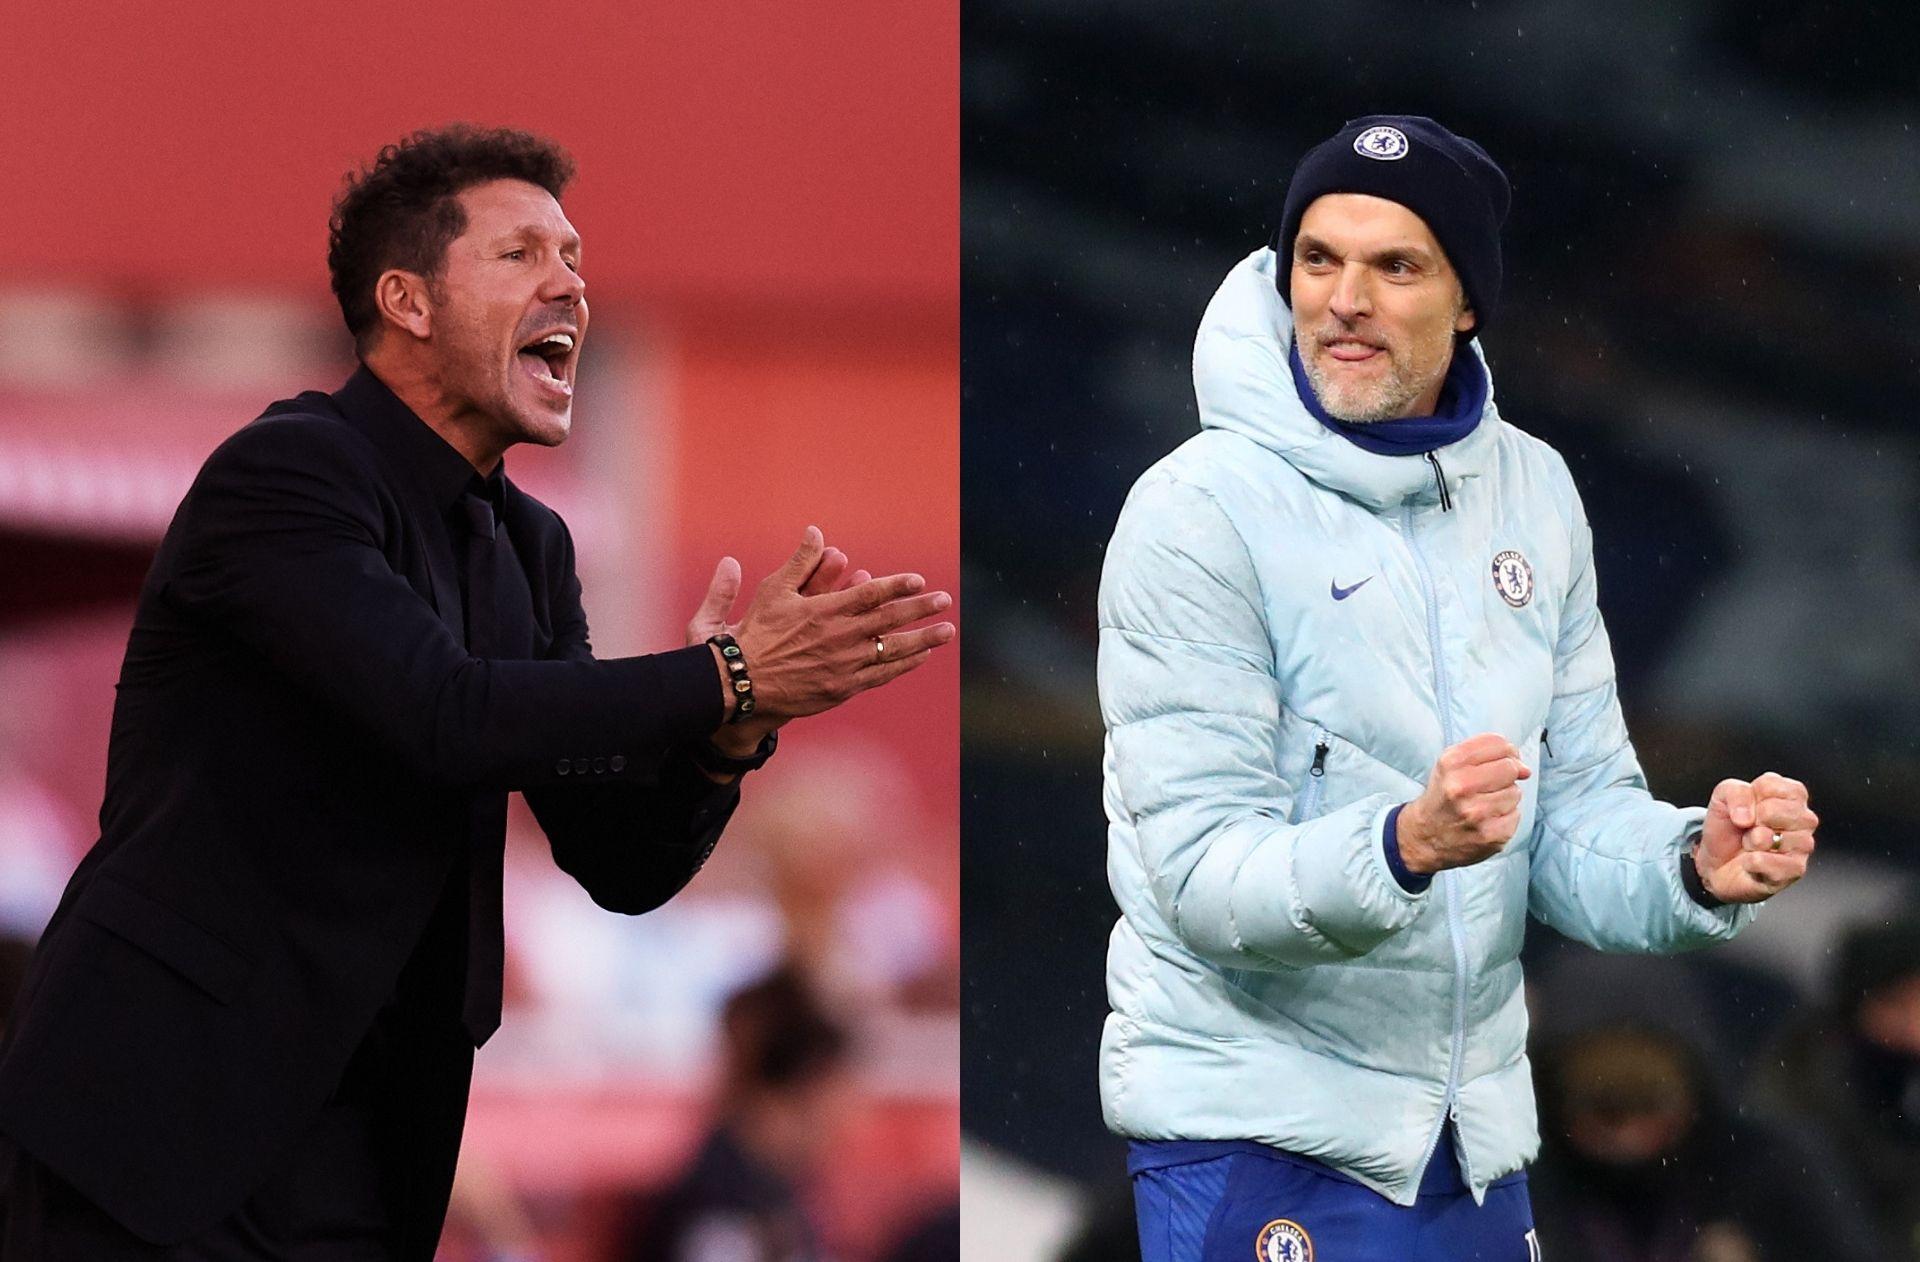 Diego Simeone of Atletico Madrid, Thomas Tuchel of Chelsea